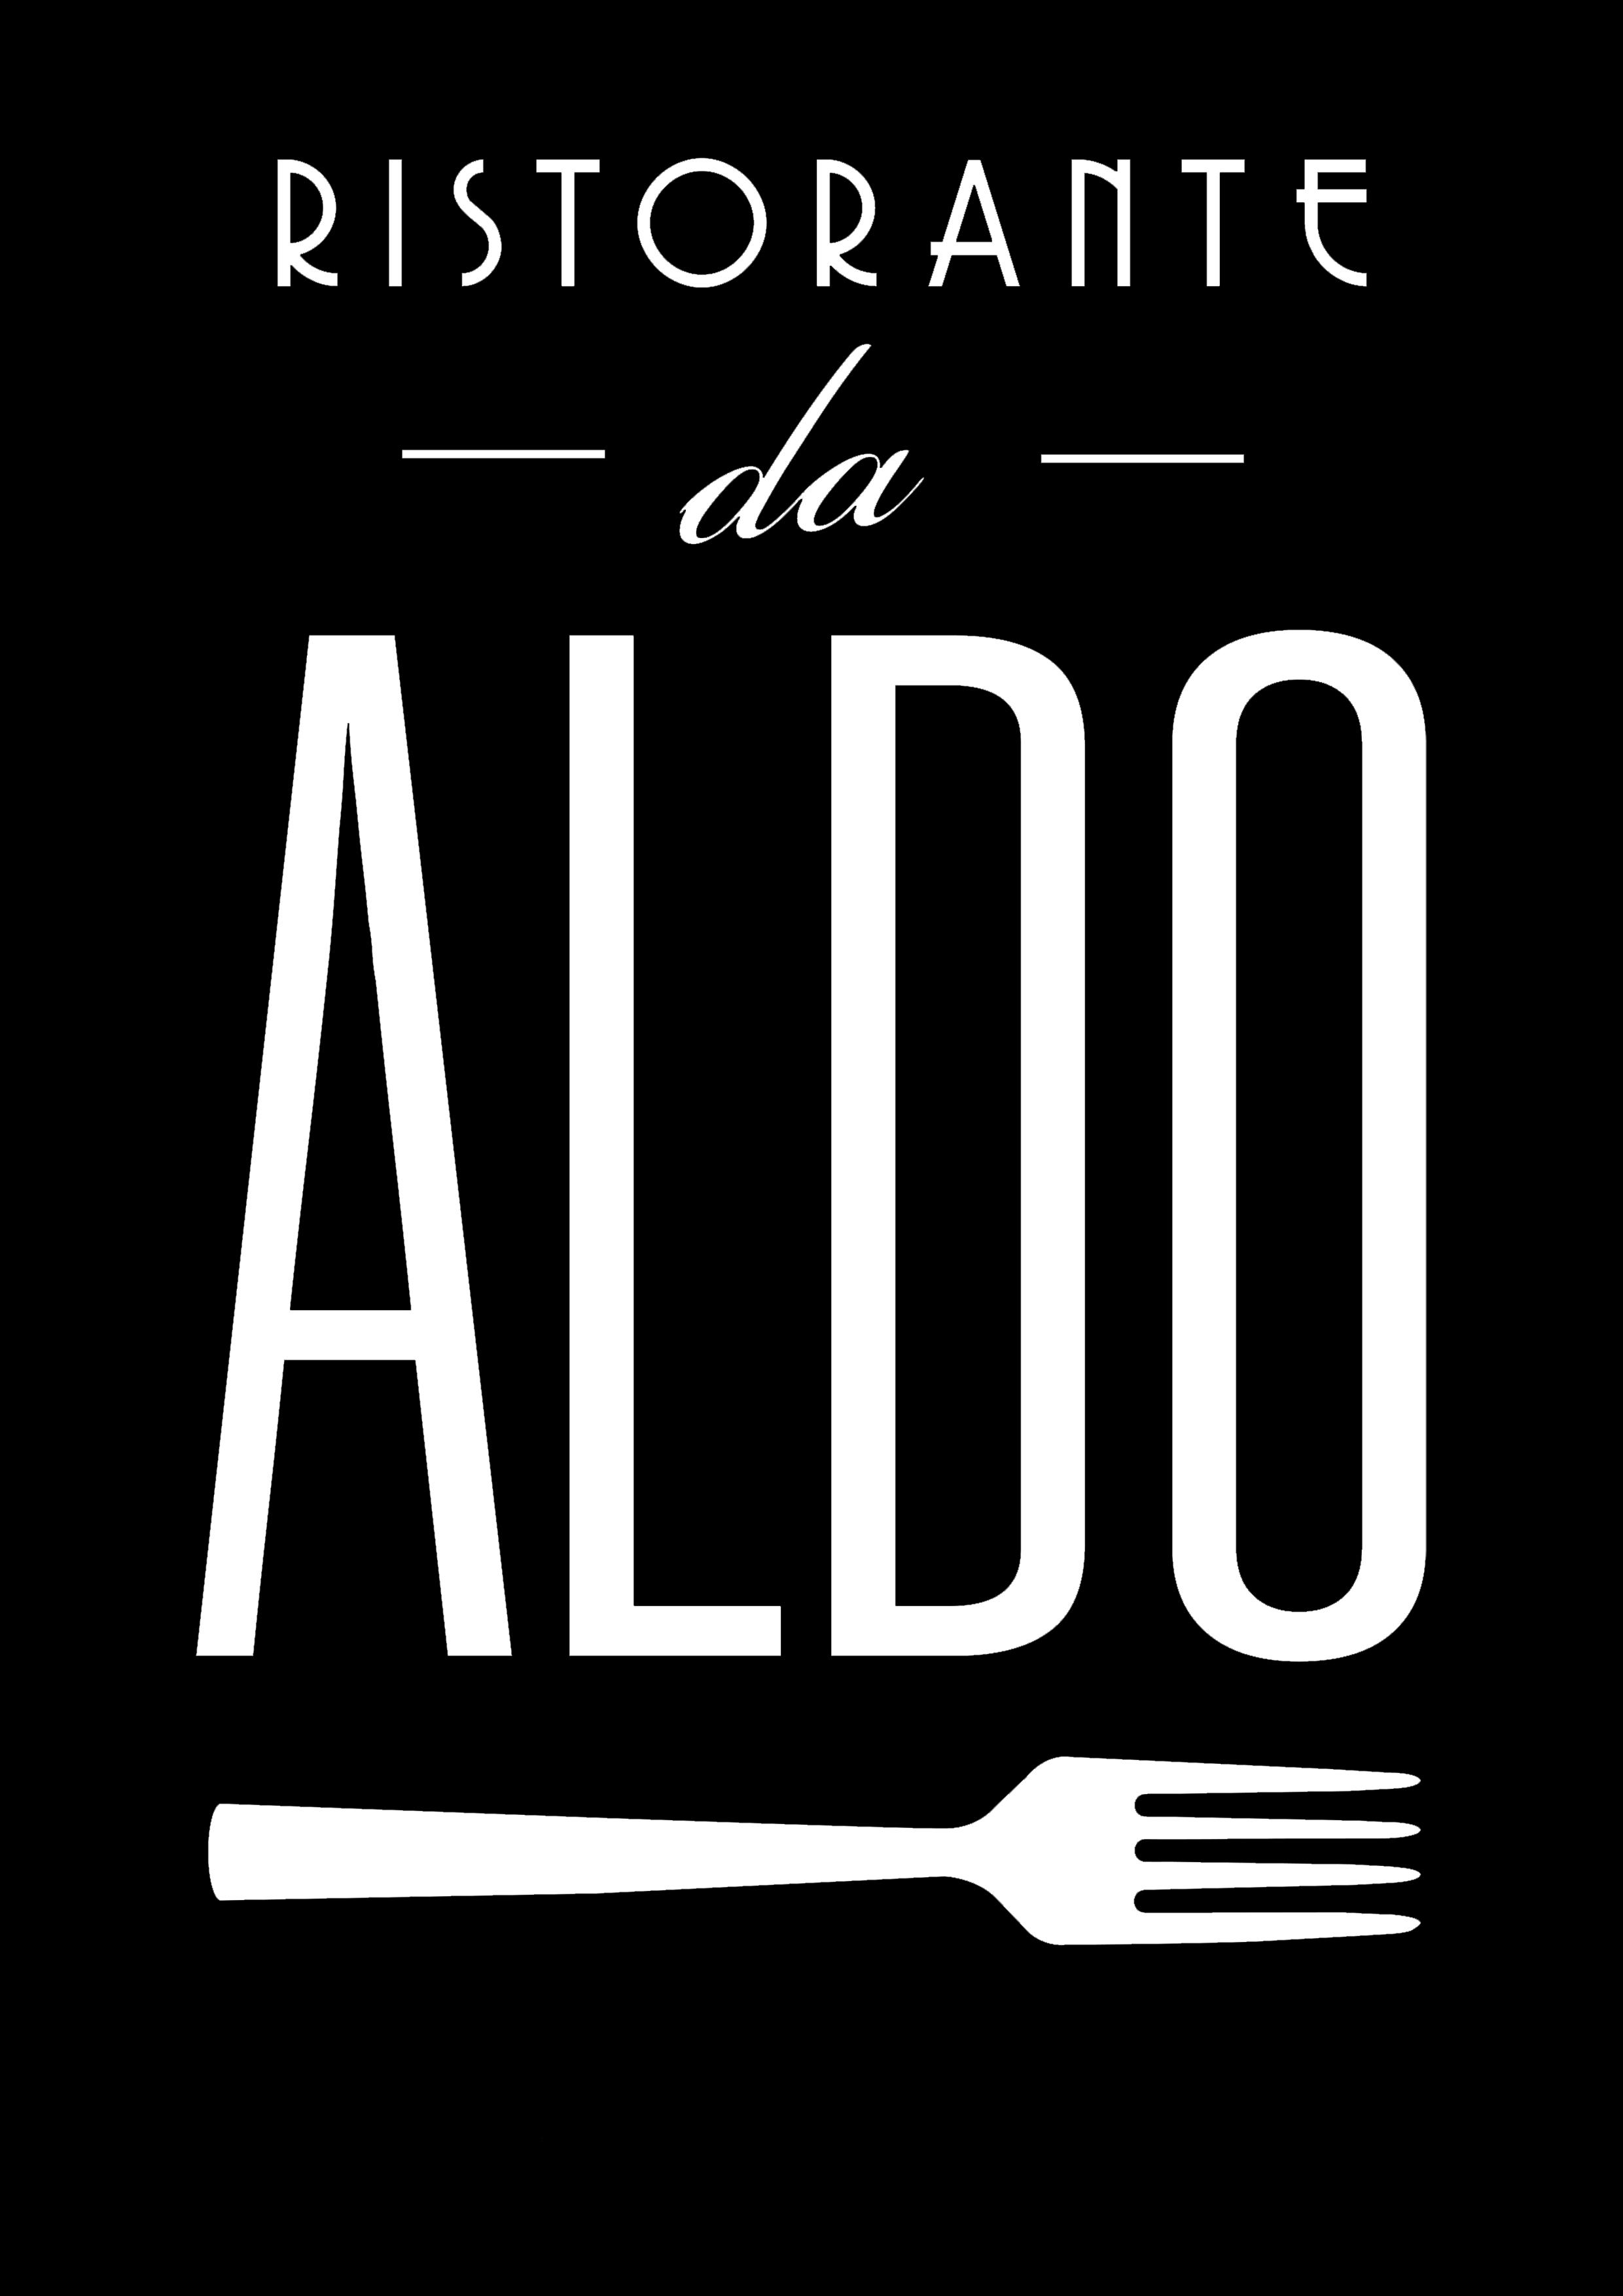 aldo-logo-bianco-nero.jpg